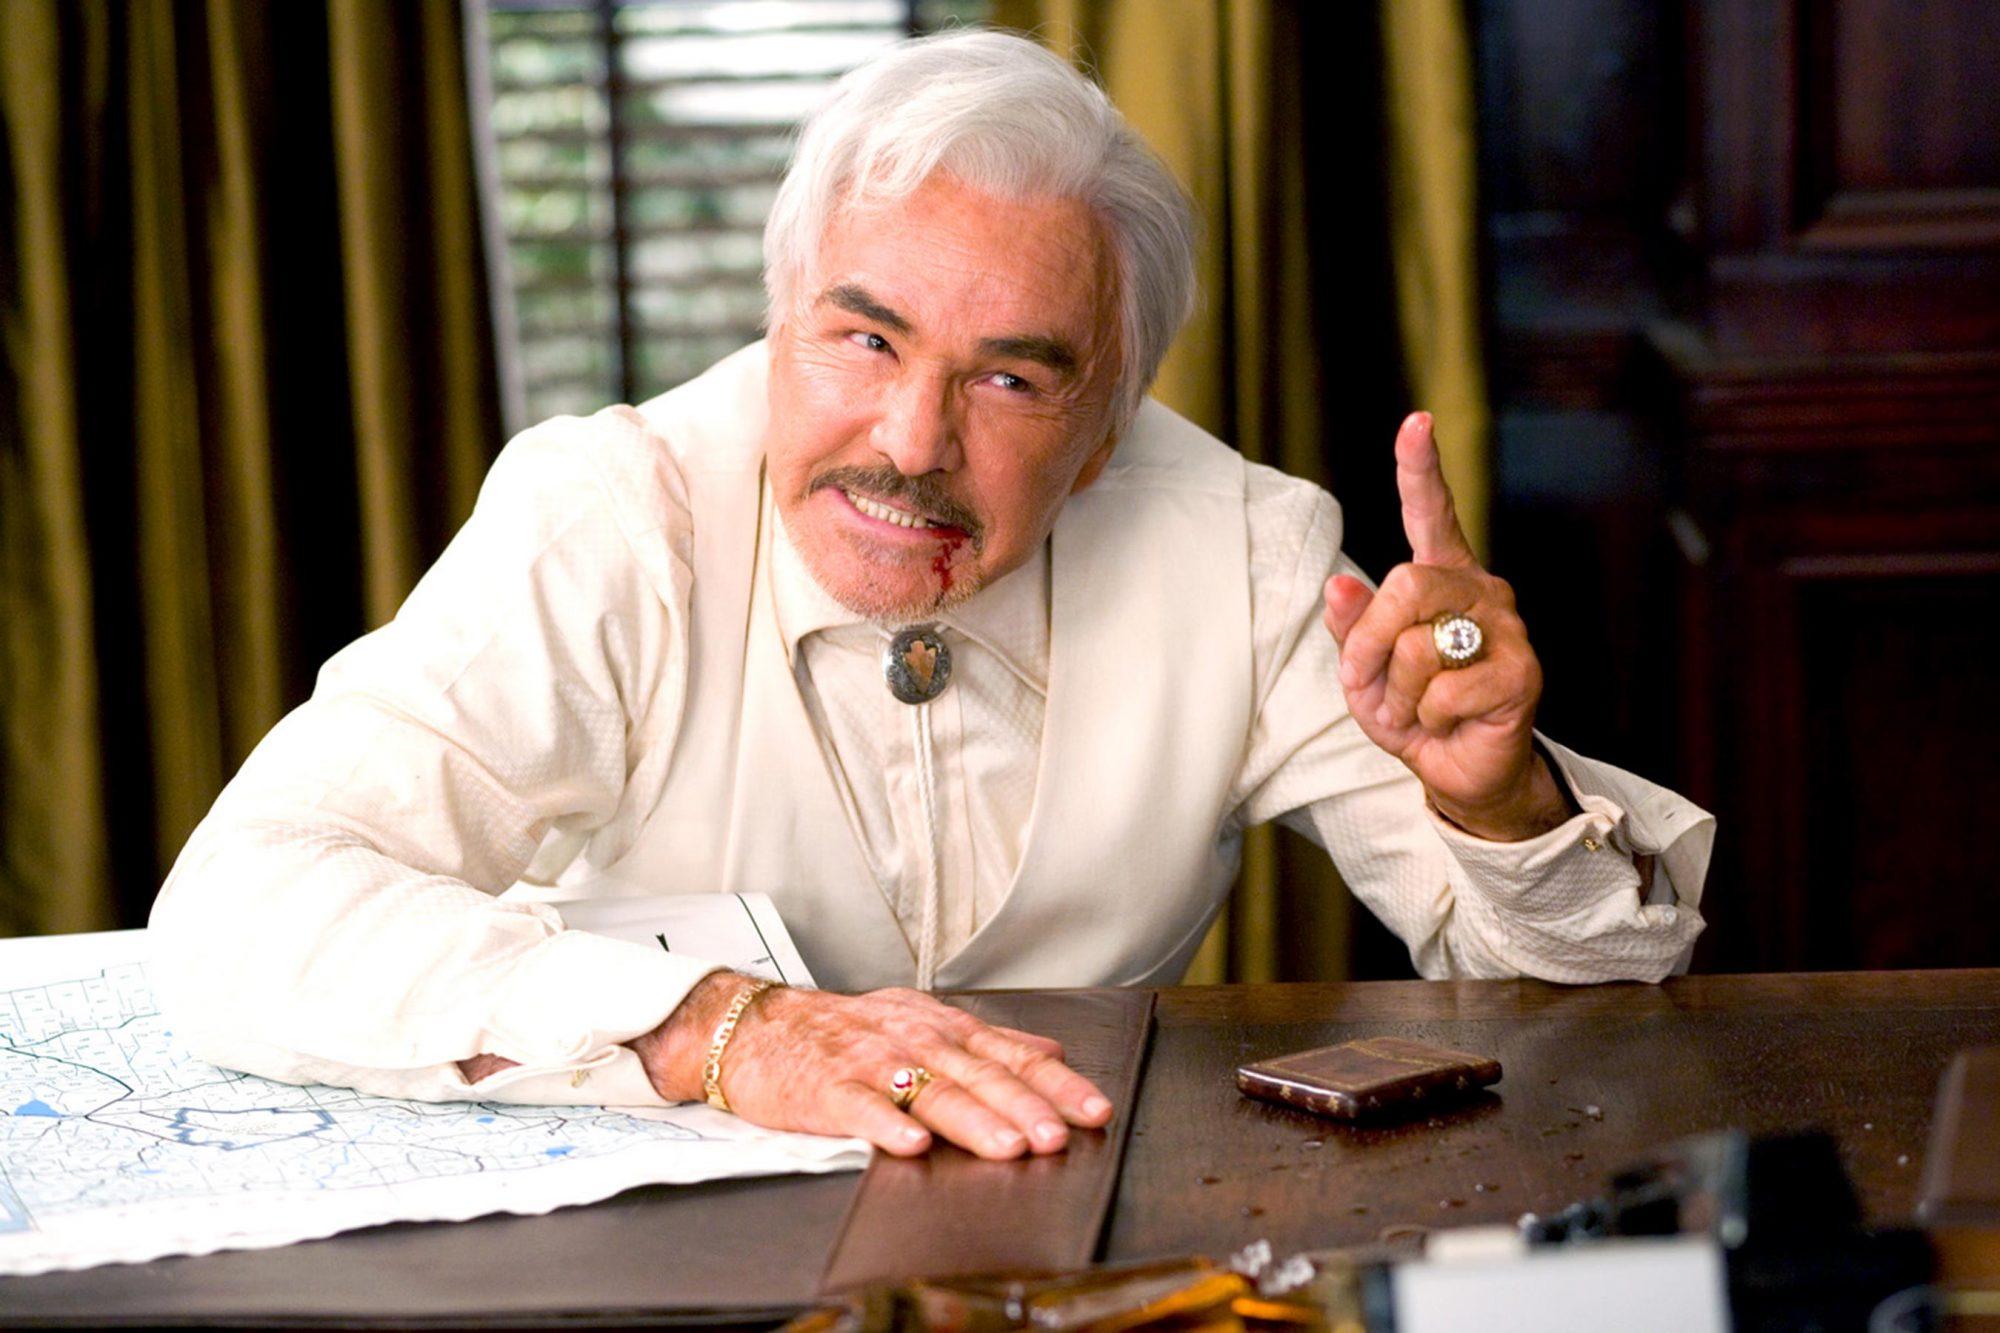 THE DUKES OF HAZZARD, Burt Reynolds, 2005, (c) Warner Brothers/courtesy Everett Collection